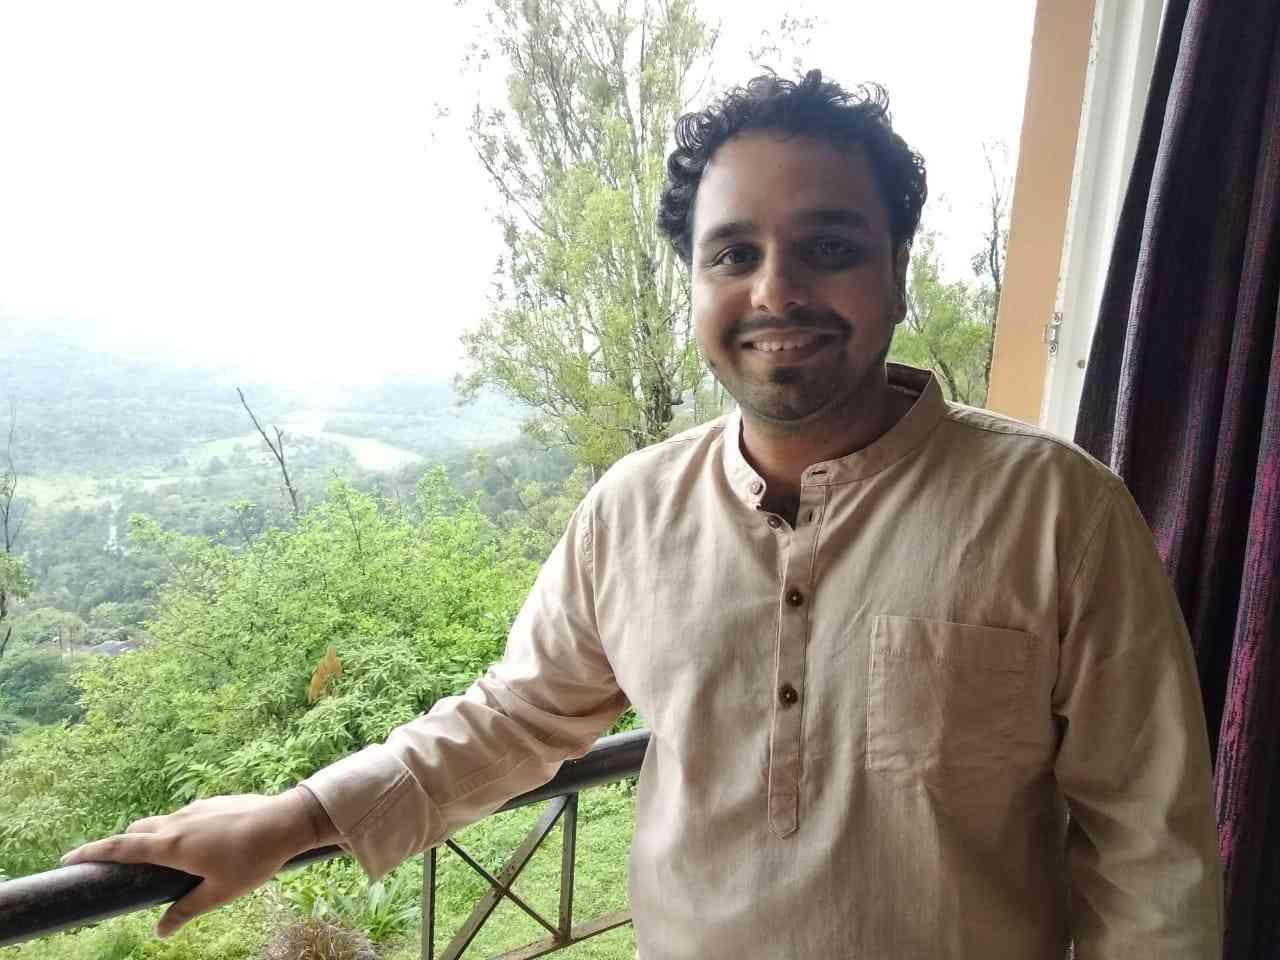 Rajat Ubhaykar